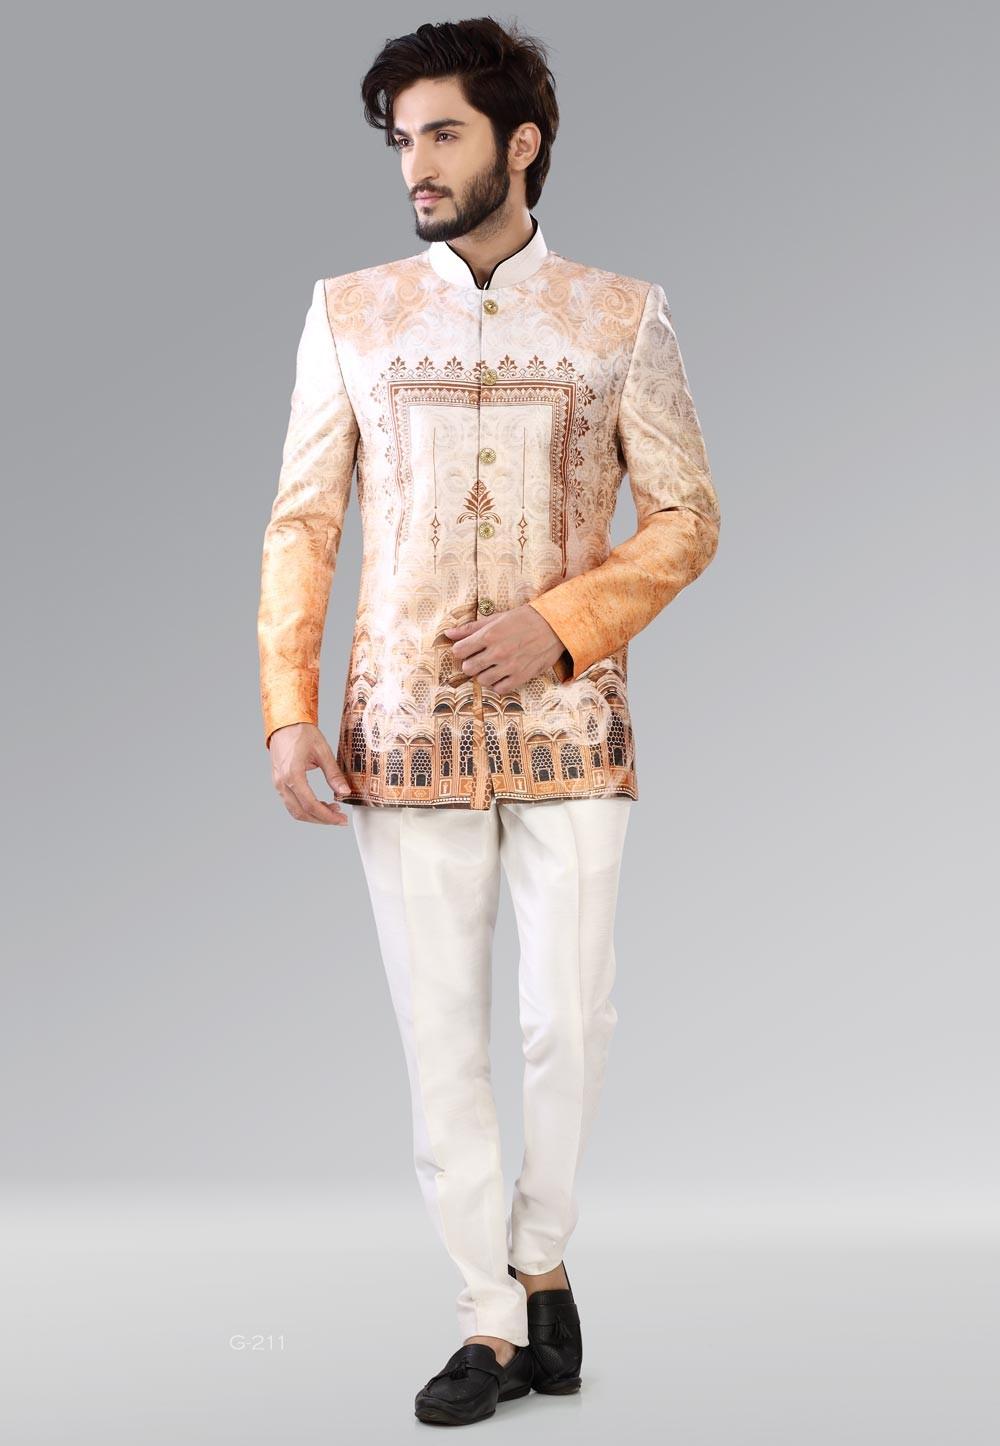 Bandhgala impressive brown, beige color Jodhpuri Suit for Mens Online USA